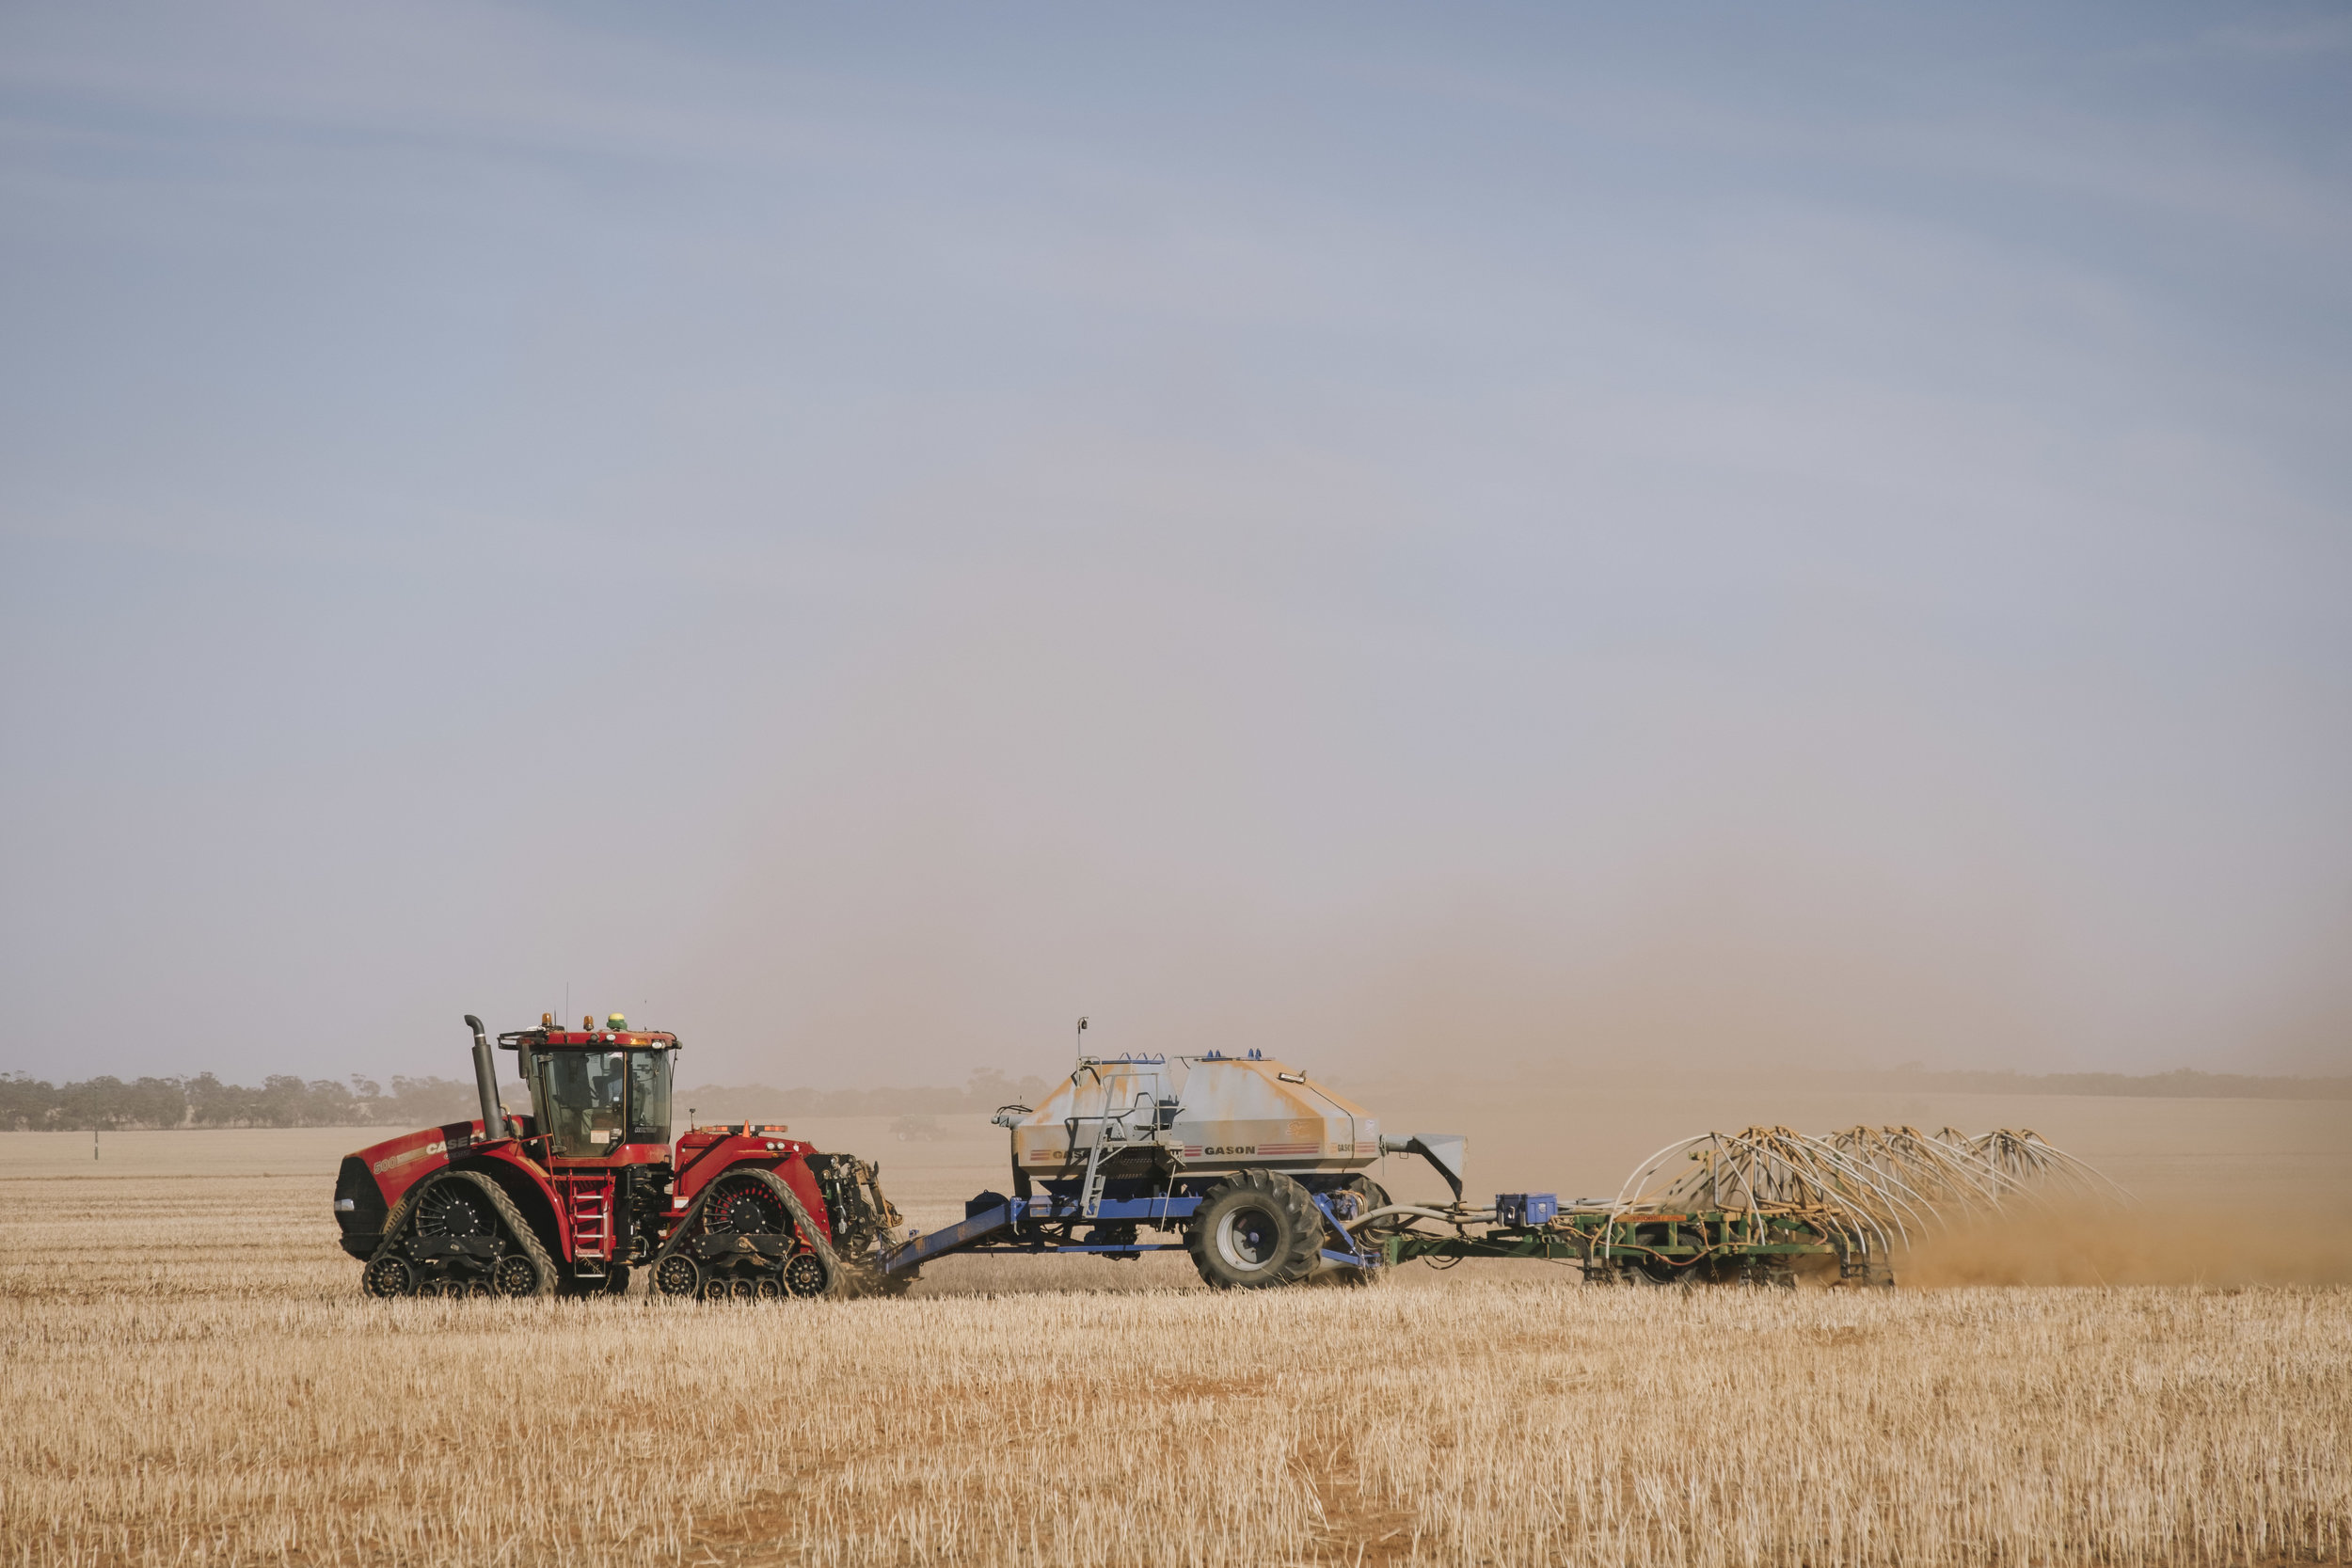 Angie Roe Photography Wheatbelt Rural Farm Landscape Seeding (11).jpg